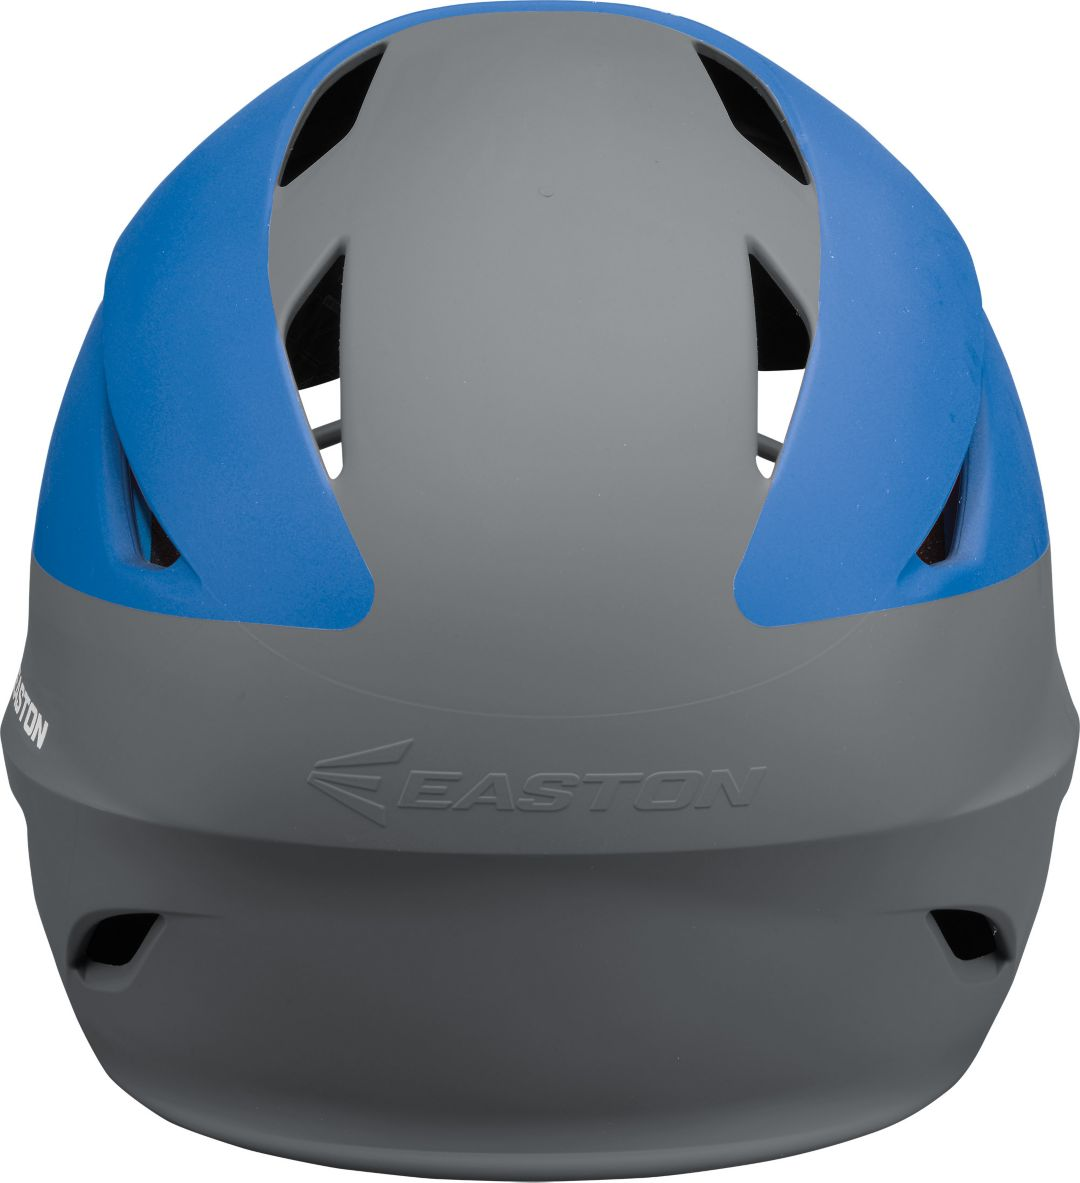 Easton Prowess Grip Two-Tone Fastpitch Batting Helmet w/ Mask